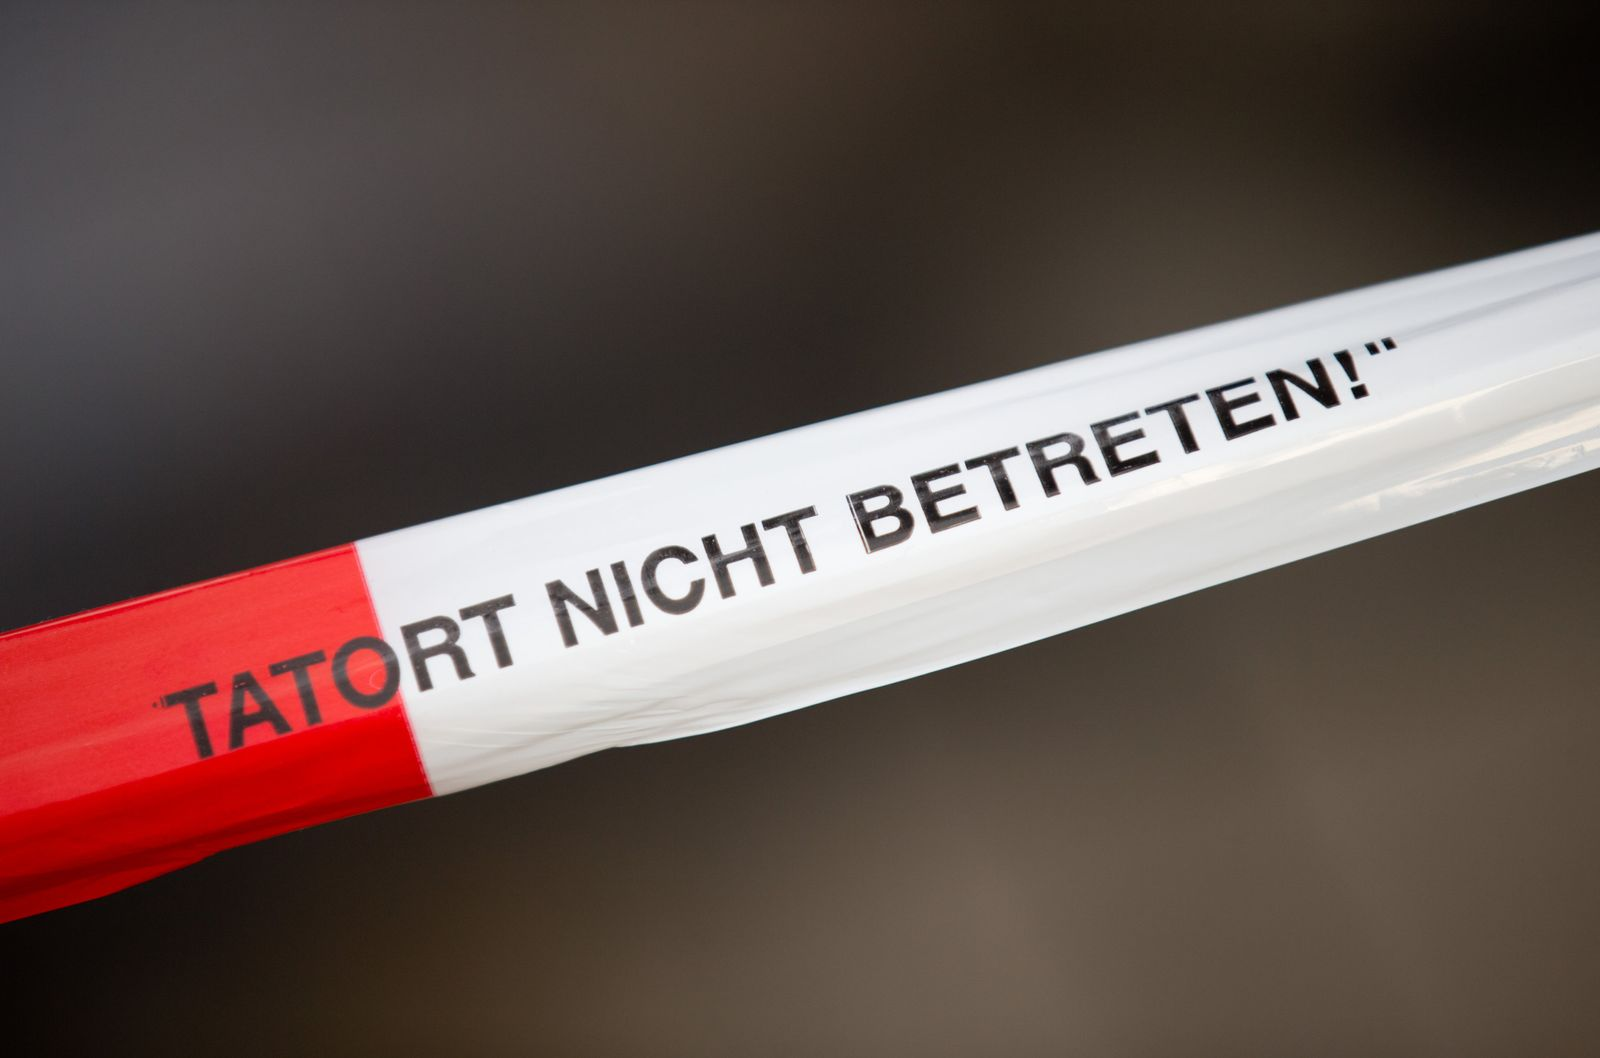 Karlsruhe/ Bretten/ Ehepaar Todesfall